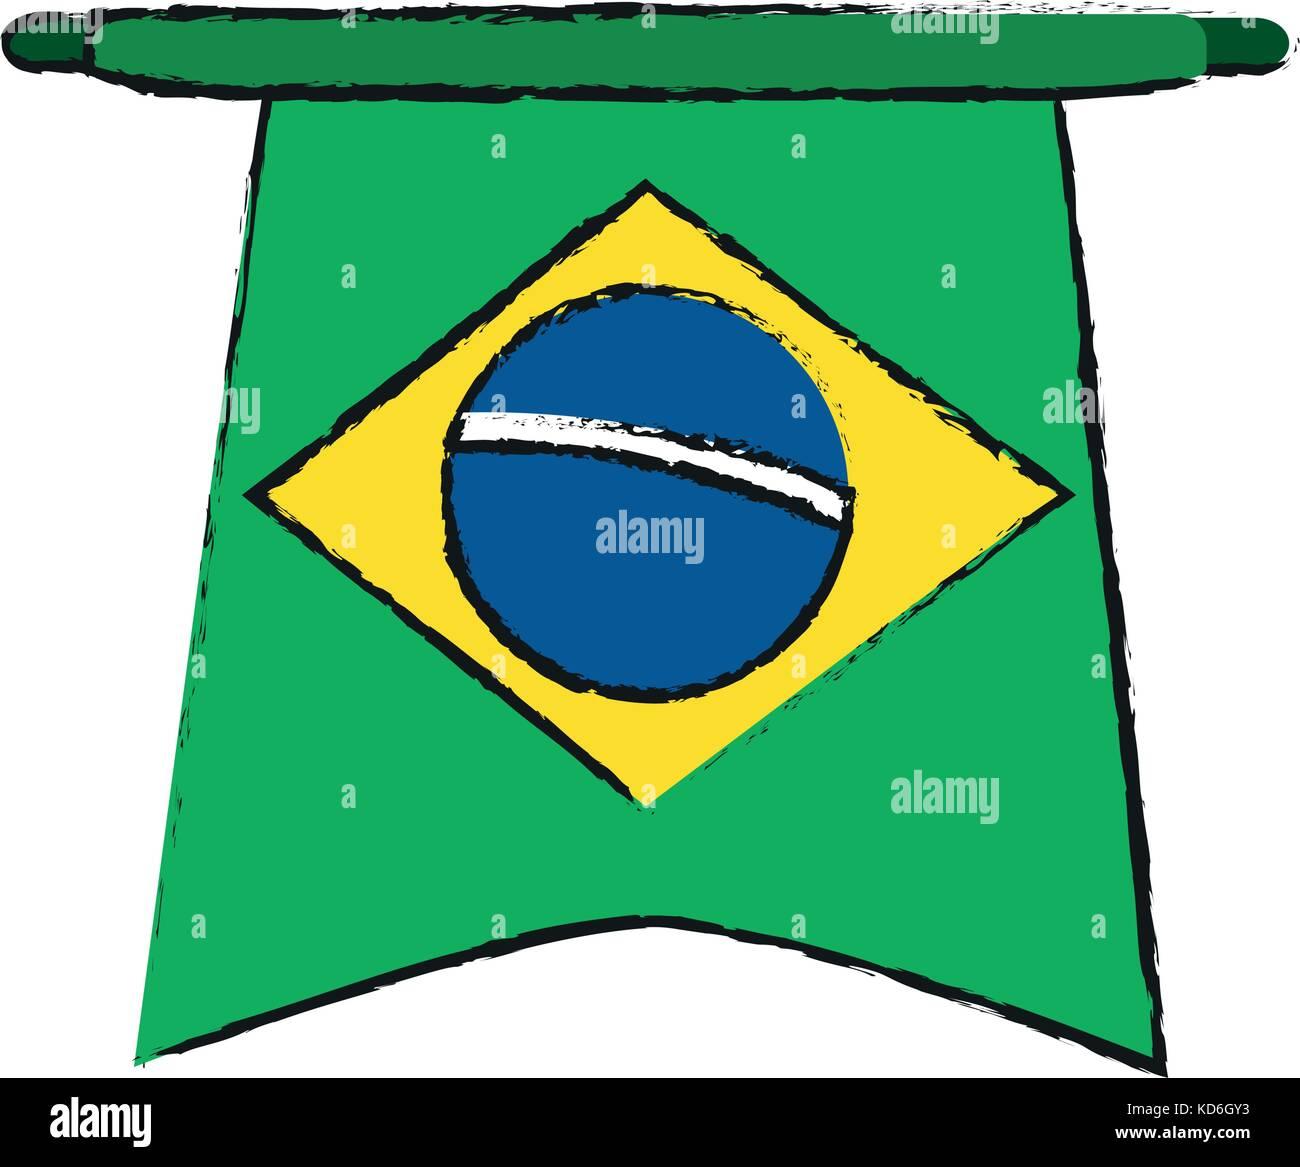 Brazil flag symbol icon vector illustration graphic design - Stock Image